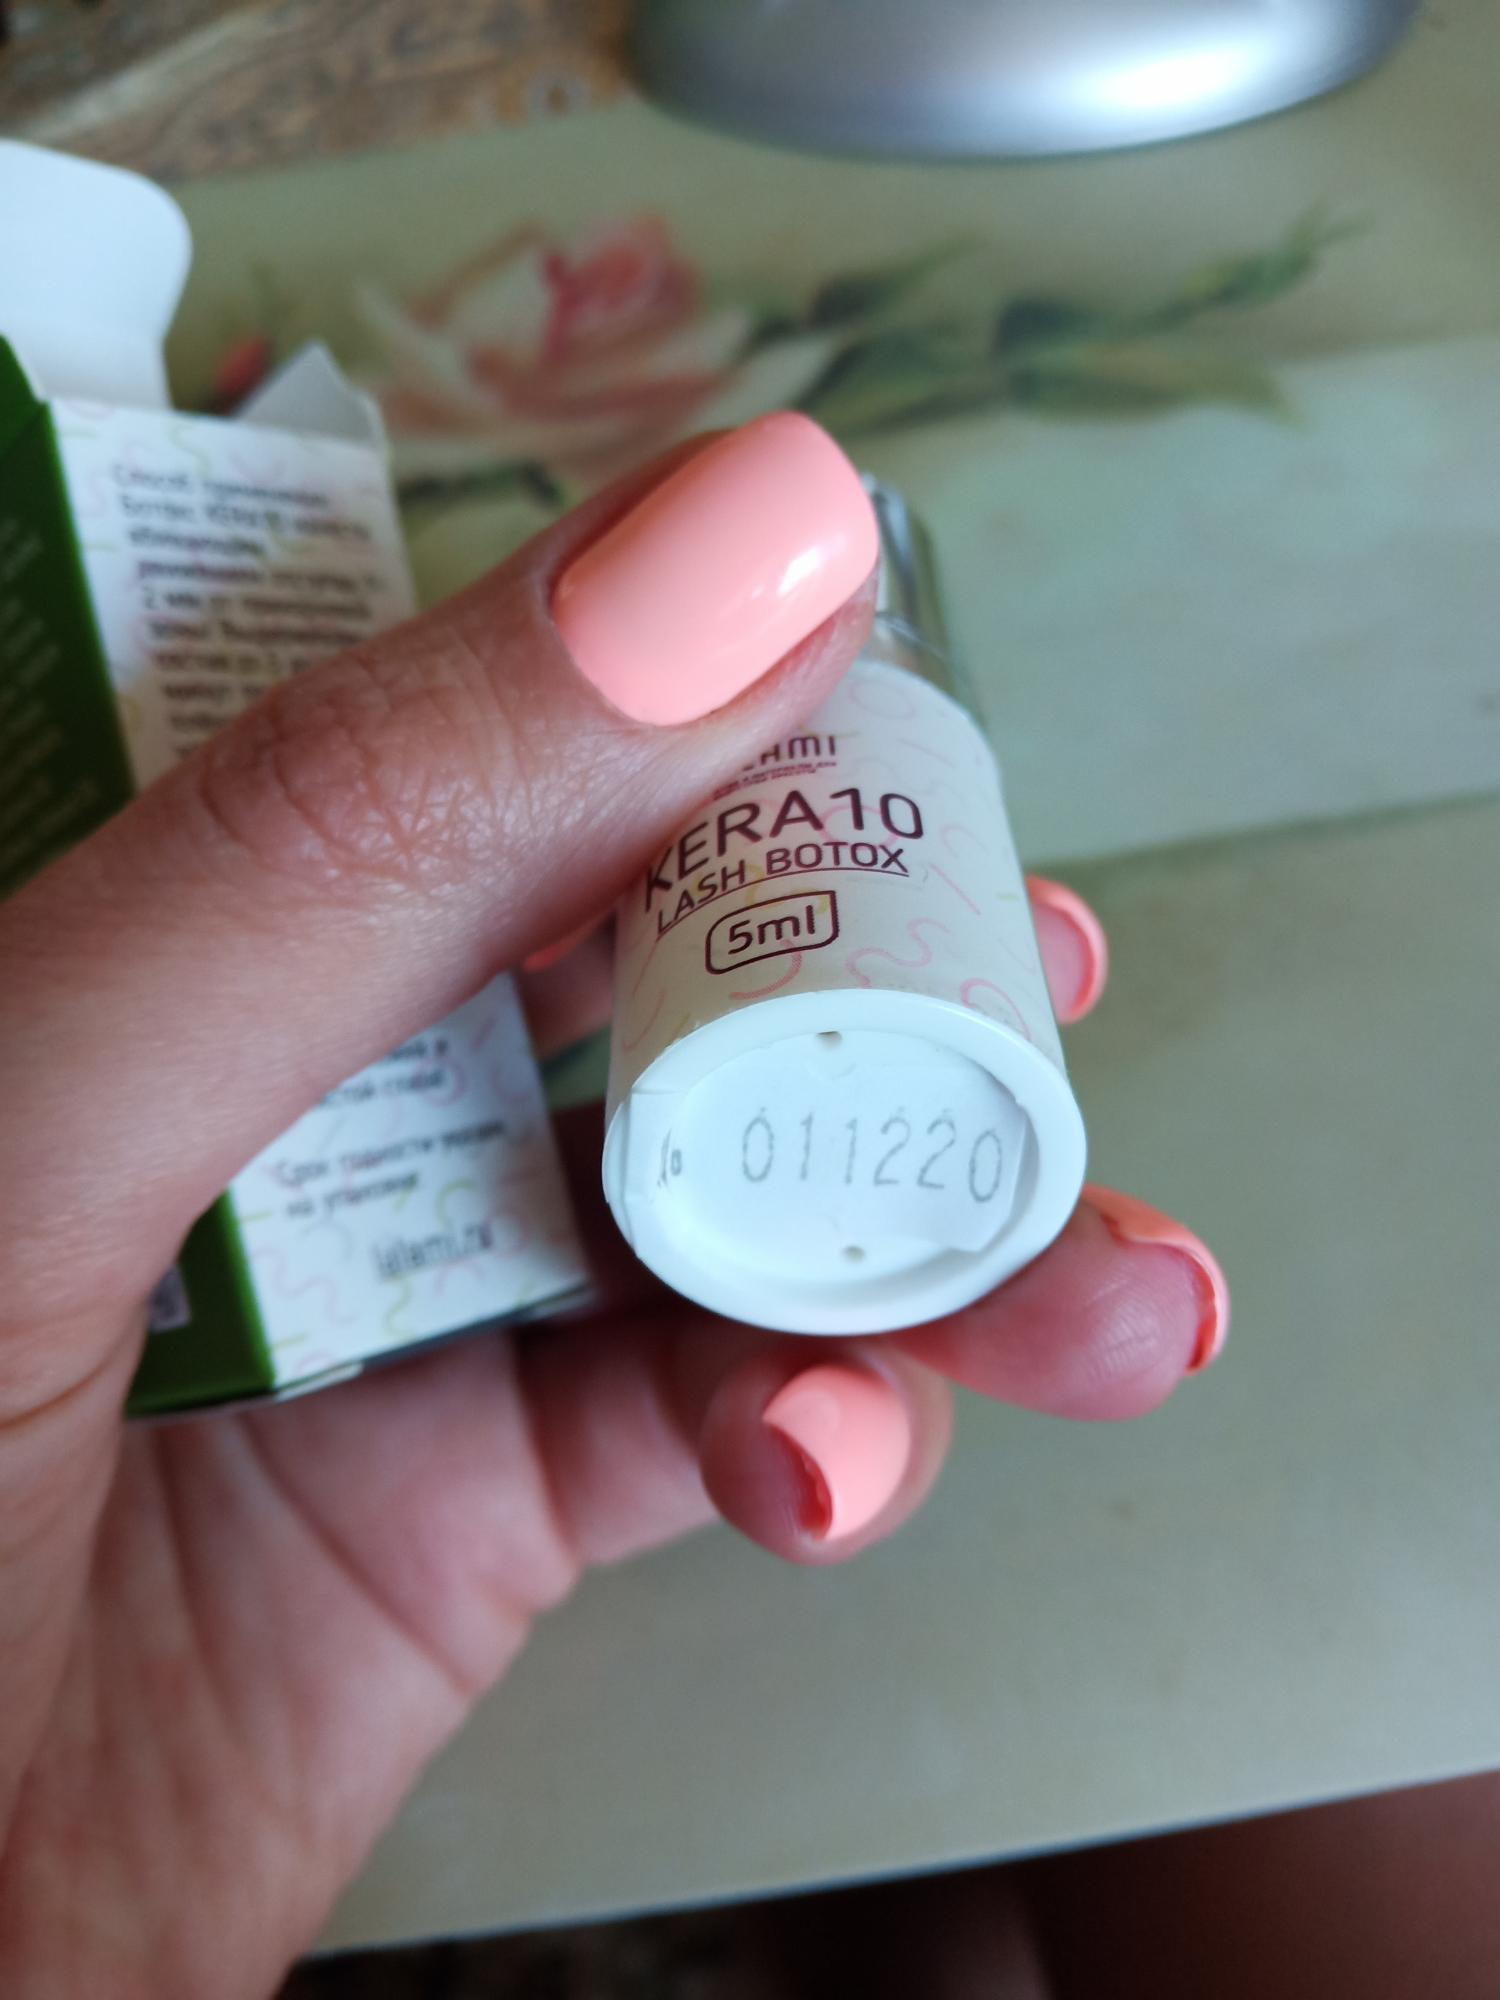 Ботокс для ресниц lash botox в Одинцово 89032760072 купить 2